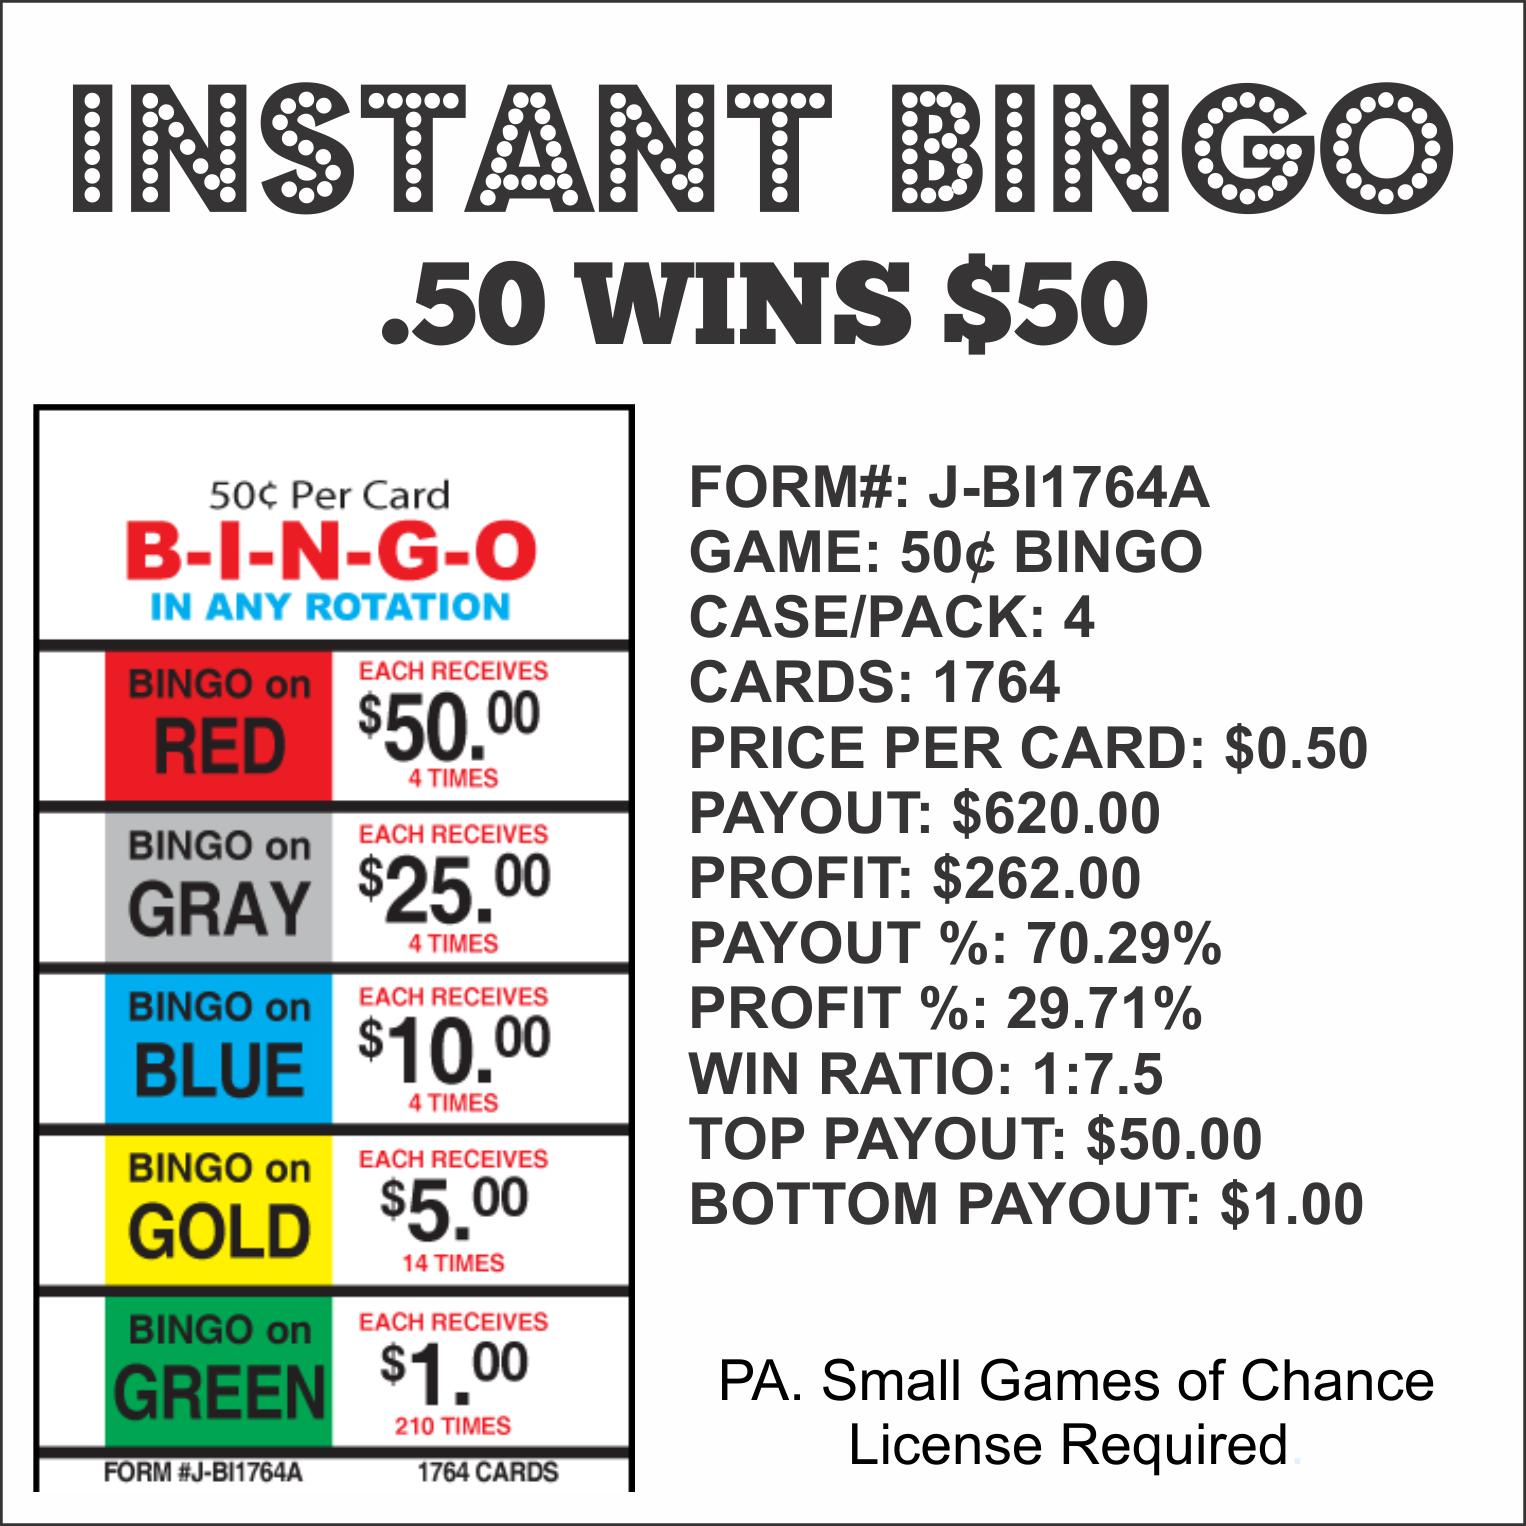 Instant Bingo .50 Wins $50